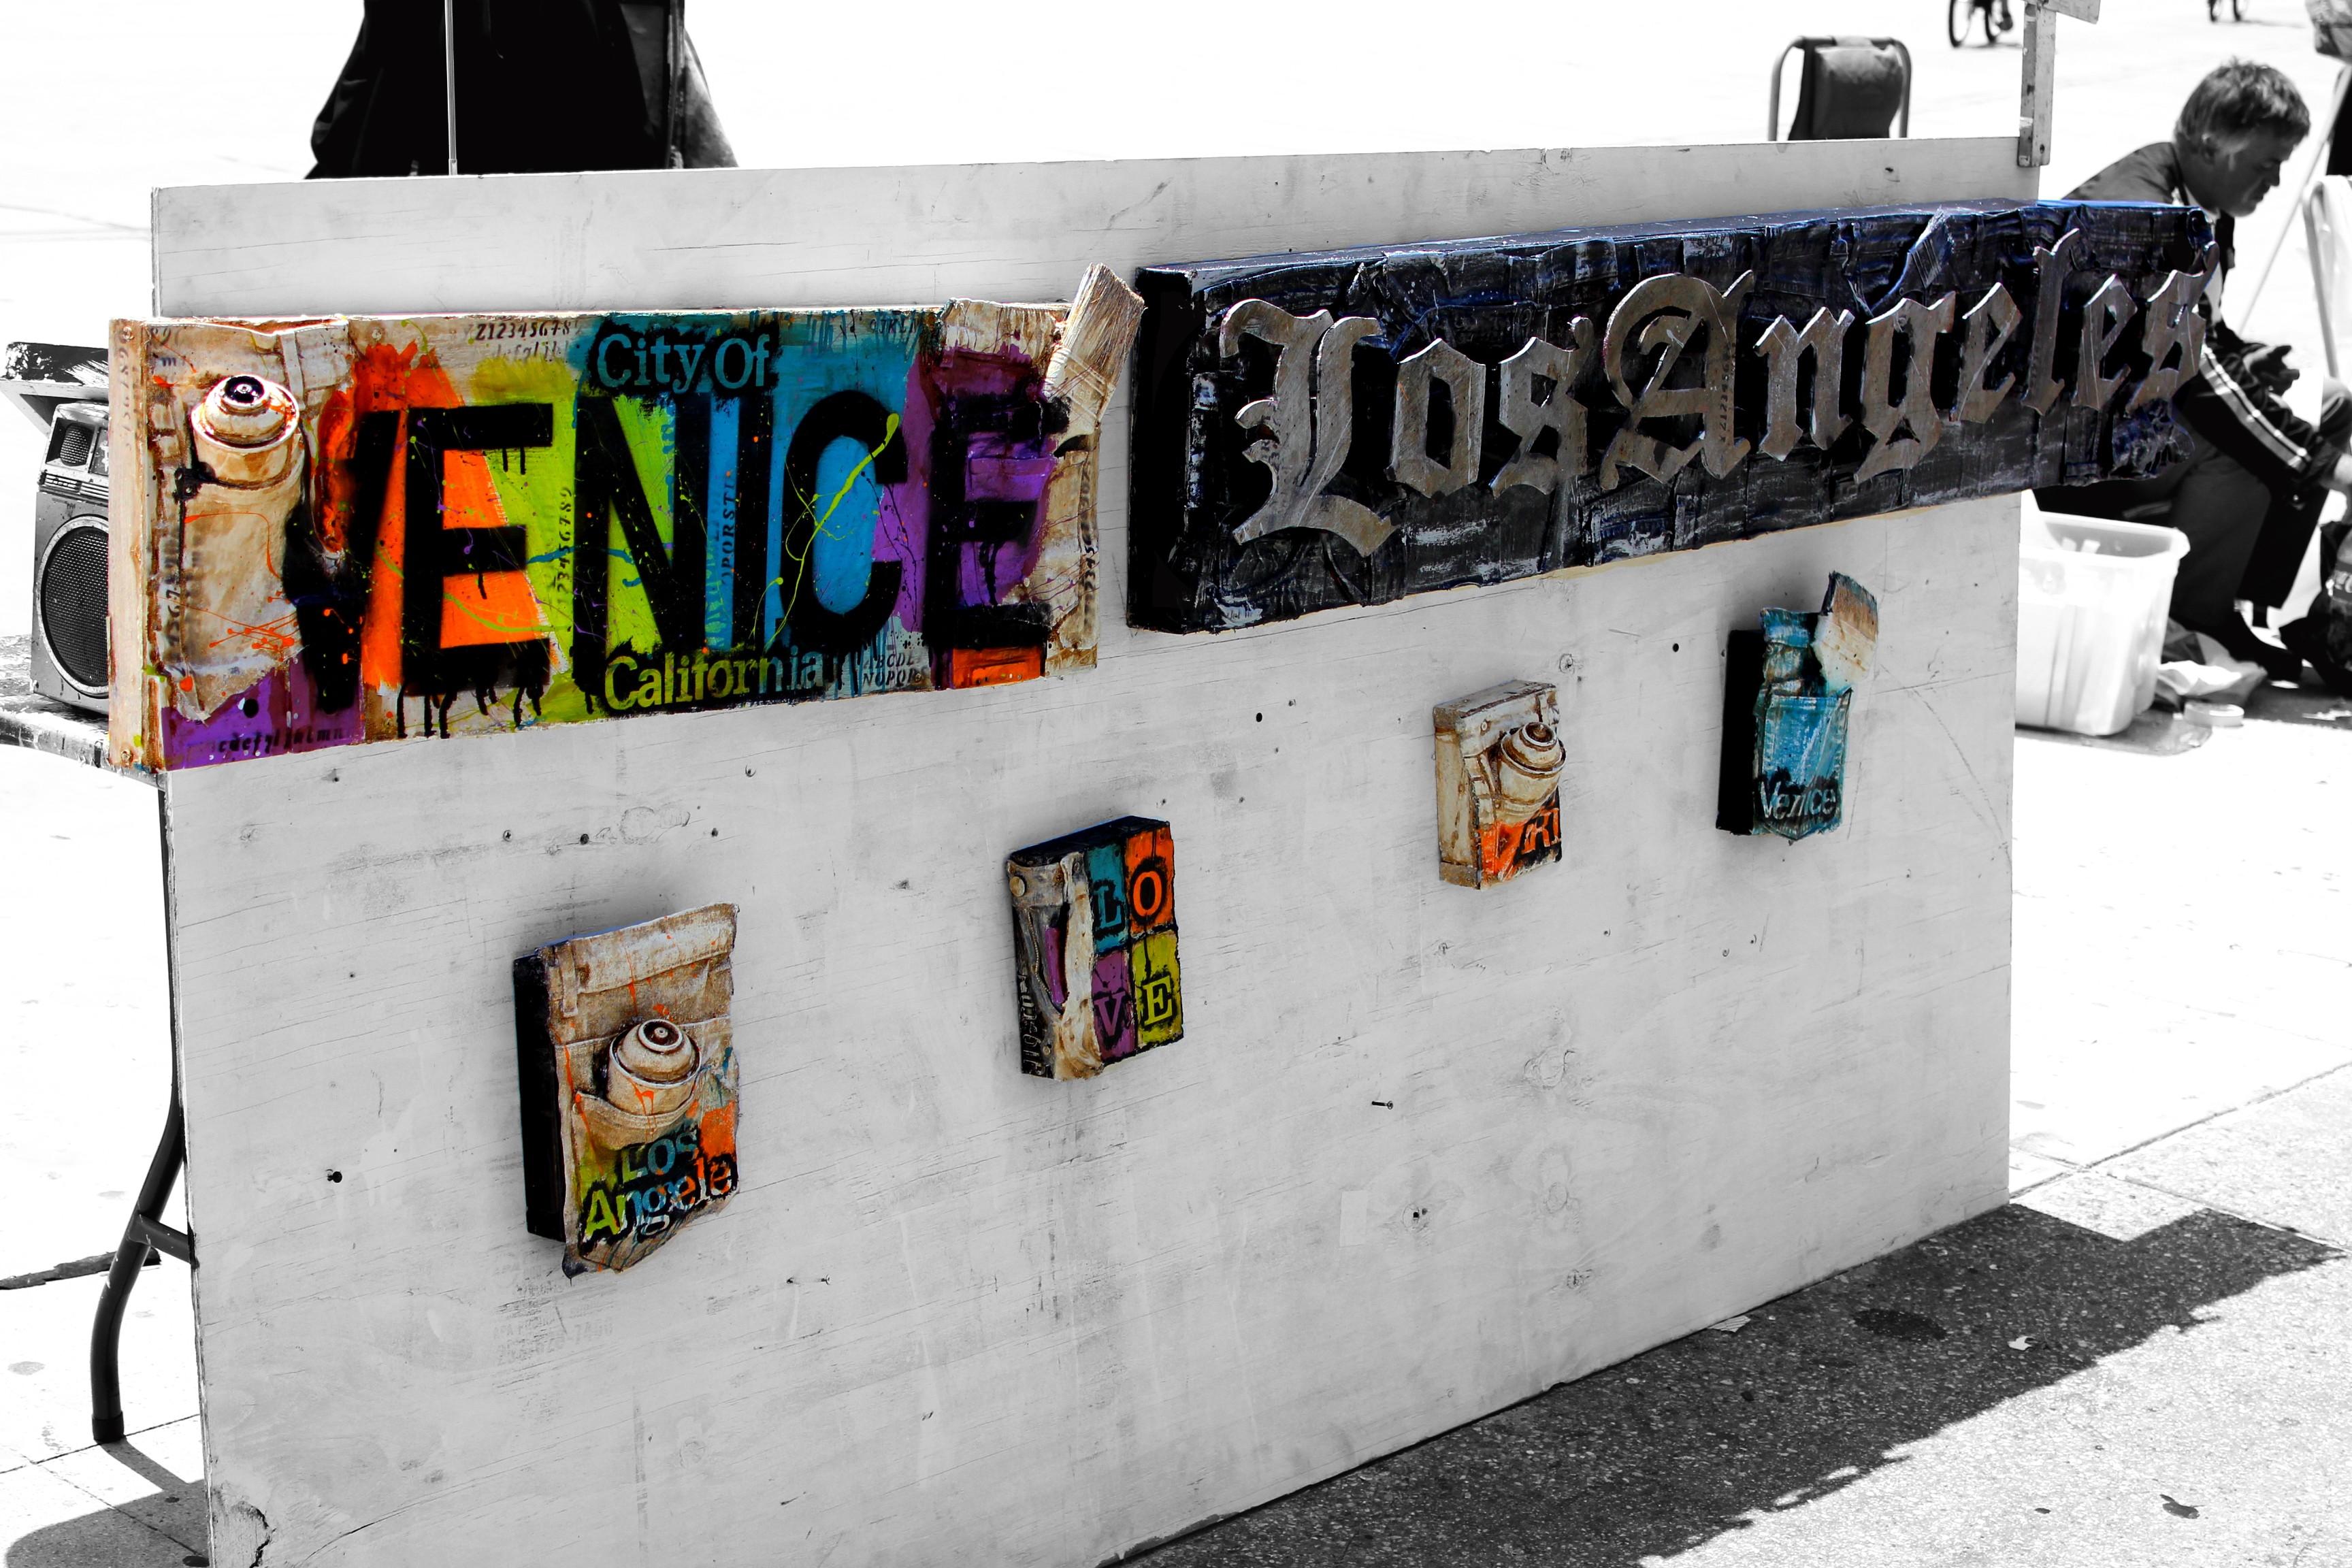 download image venice beach - photo #27